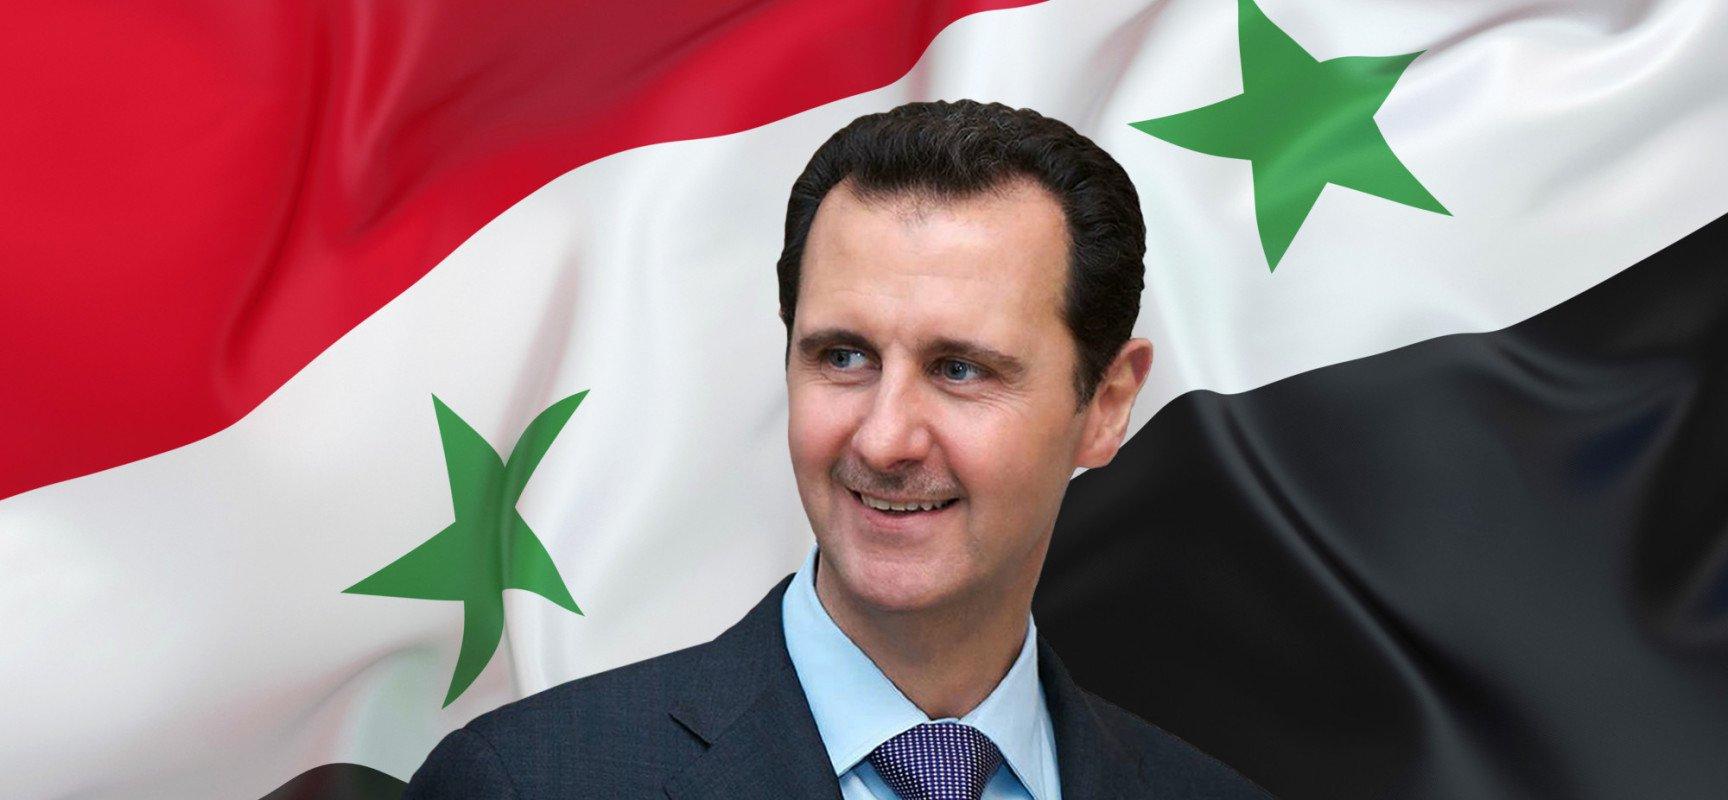 https://cdn.discordapp.com/attachments/308950154222895104/369186779816787968/Kremlin-slams-US-threats-against-Syrias-Bashar-al-Assad.jpg